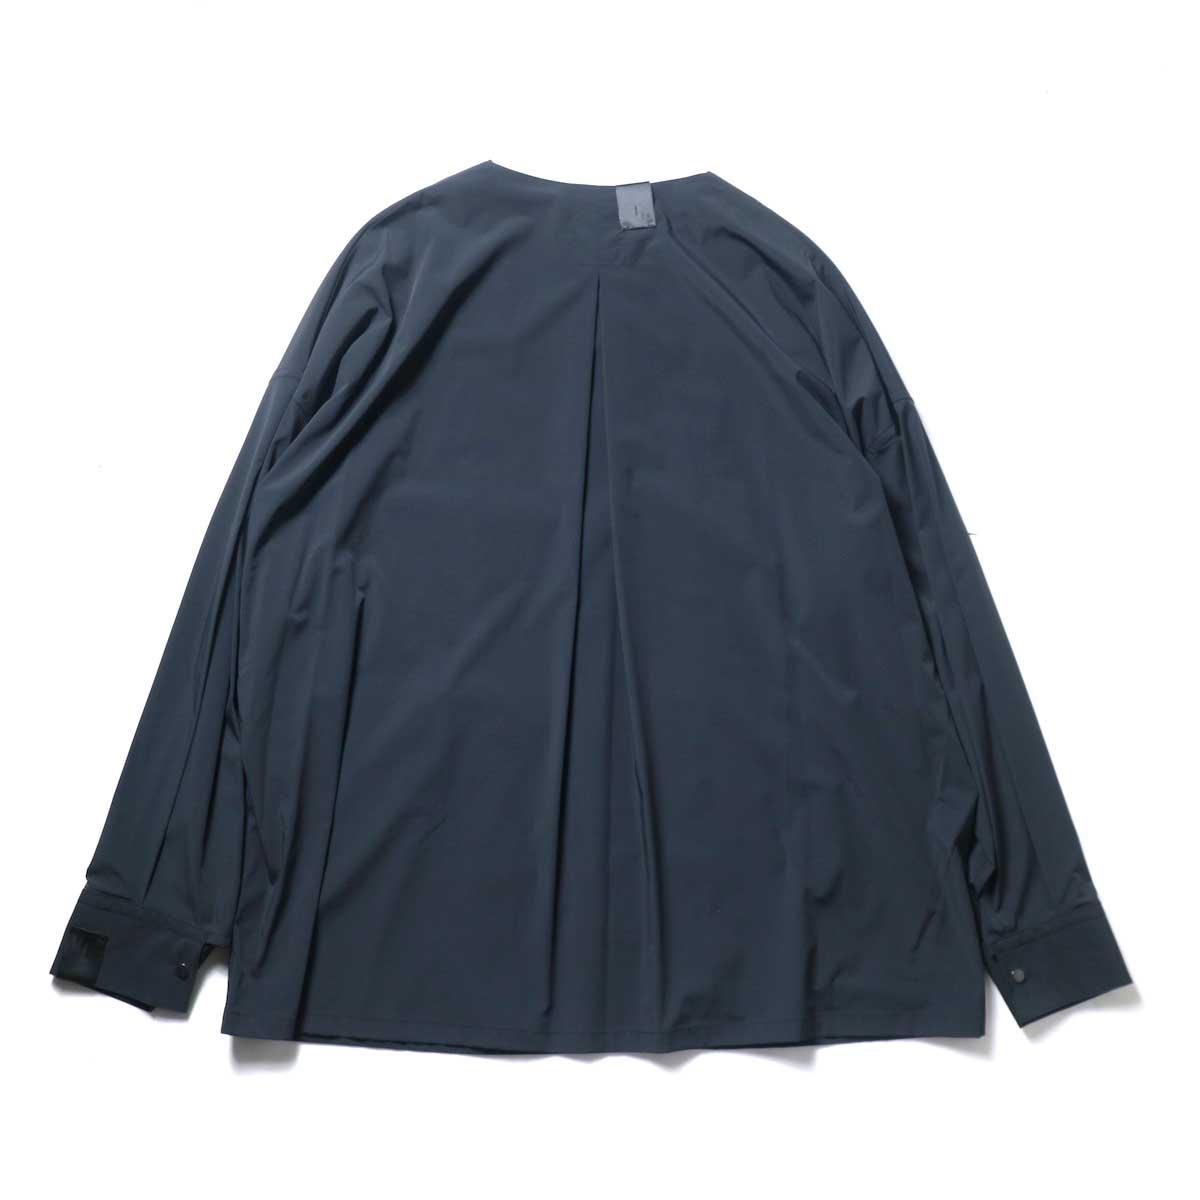 N.HOOLYWOOD / 2211-SH25-006 peg Collarless Shirt (Black)背面